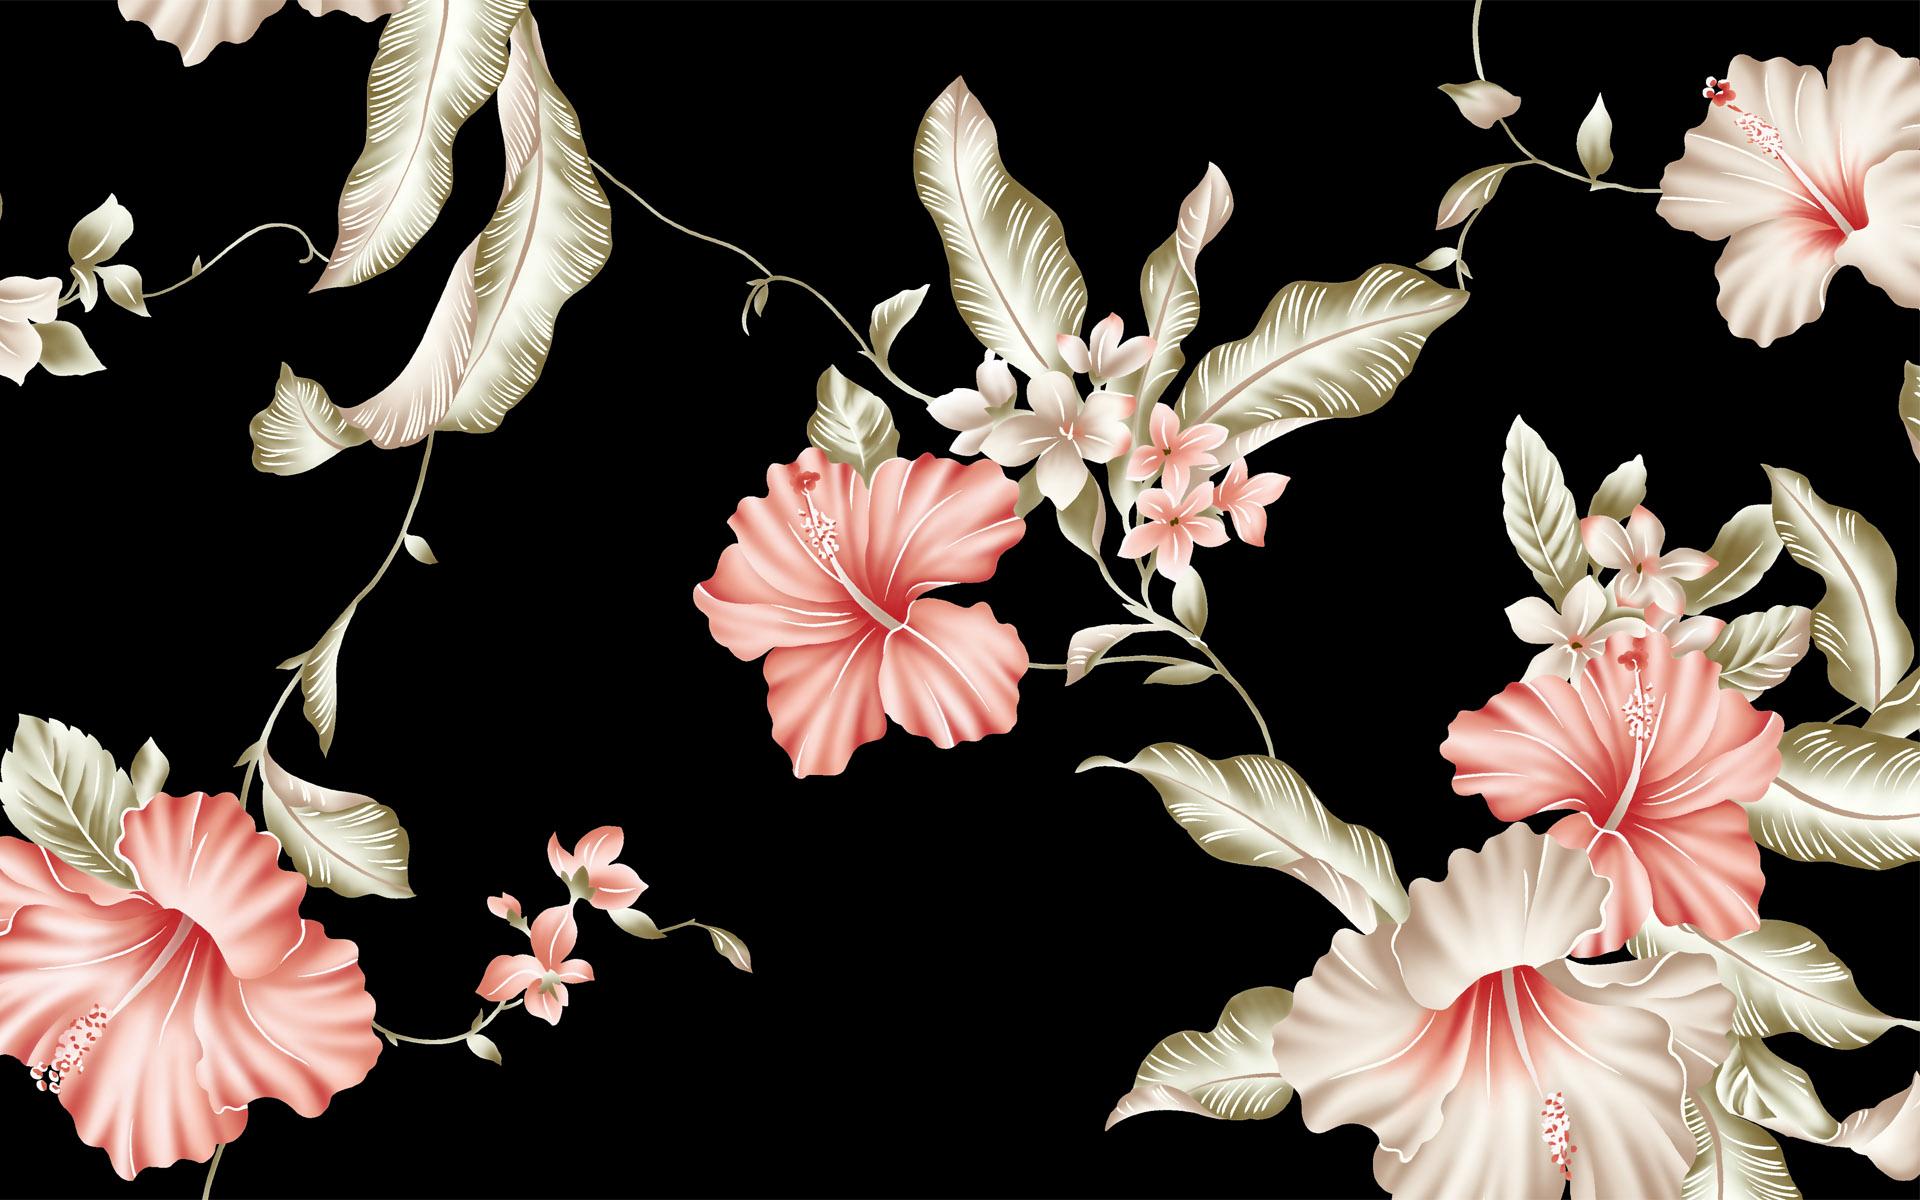 1920x1200 Flower Pattern desktop PC and Mac wallpaper 1920x1200